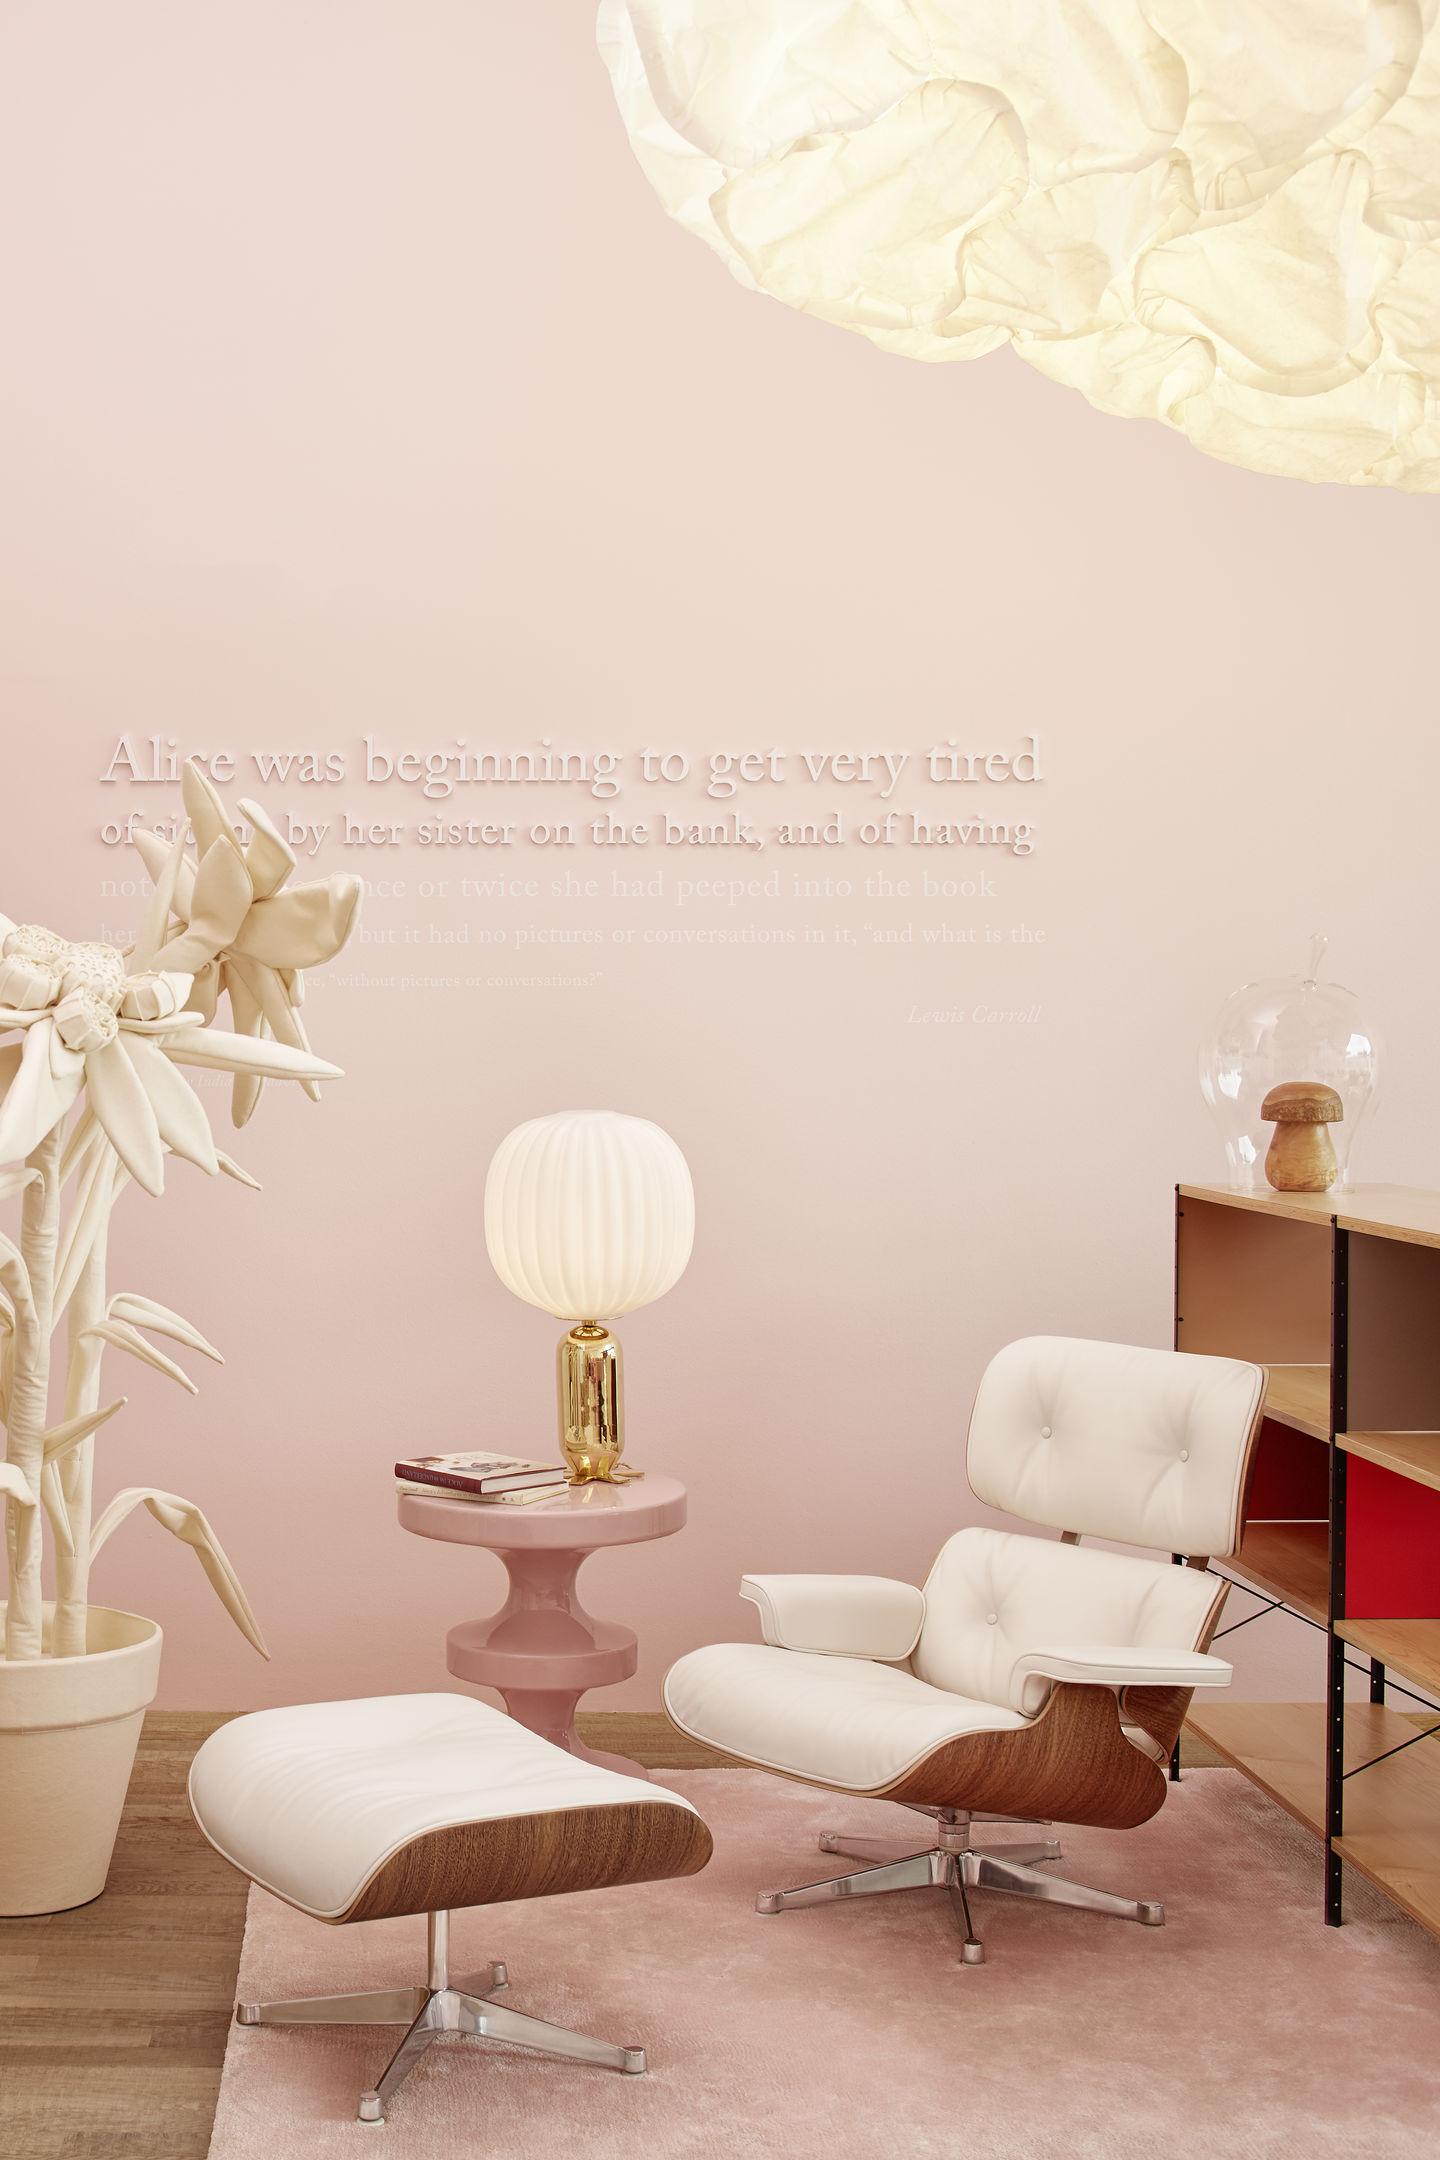 vitra india mahdavi verwandelt das loft in alices wunderland. Black Bedroom Furniture Sets. Home Design Ideas